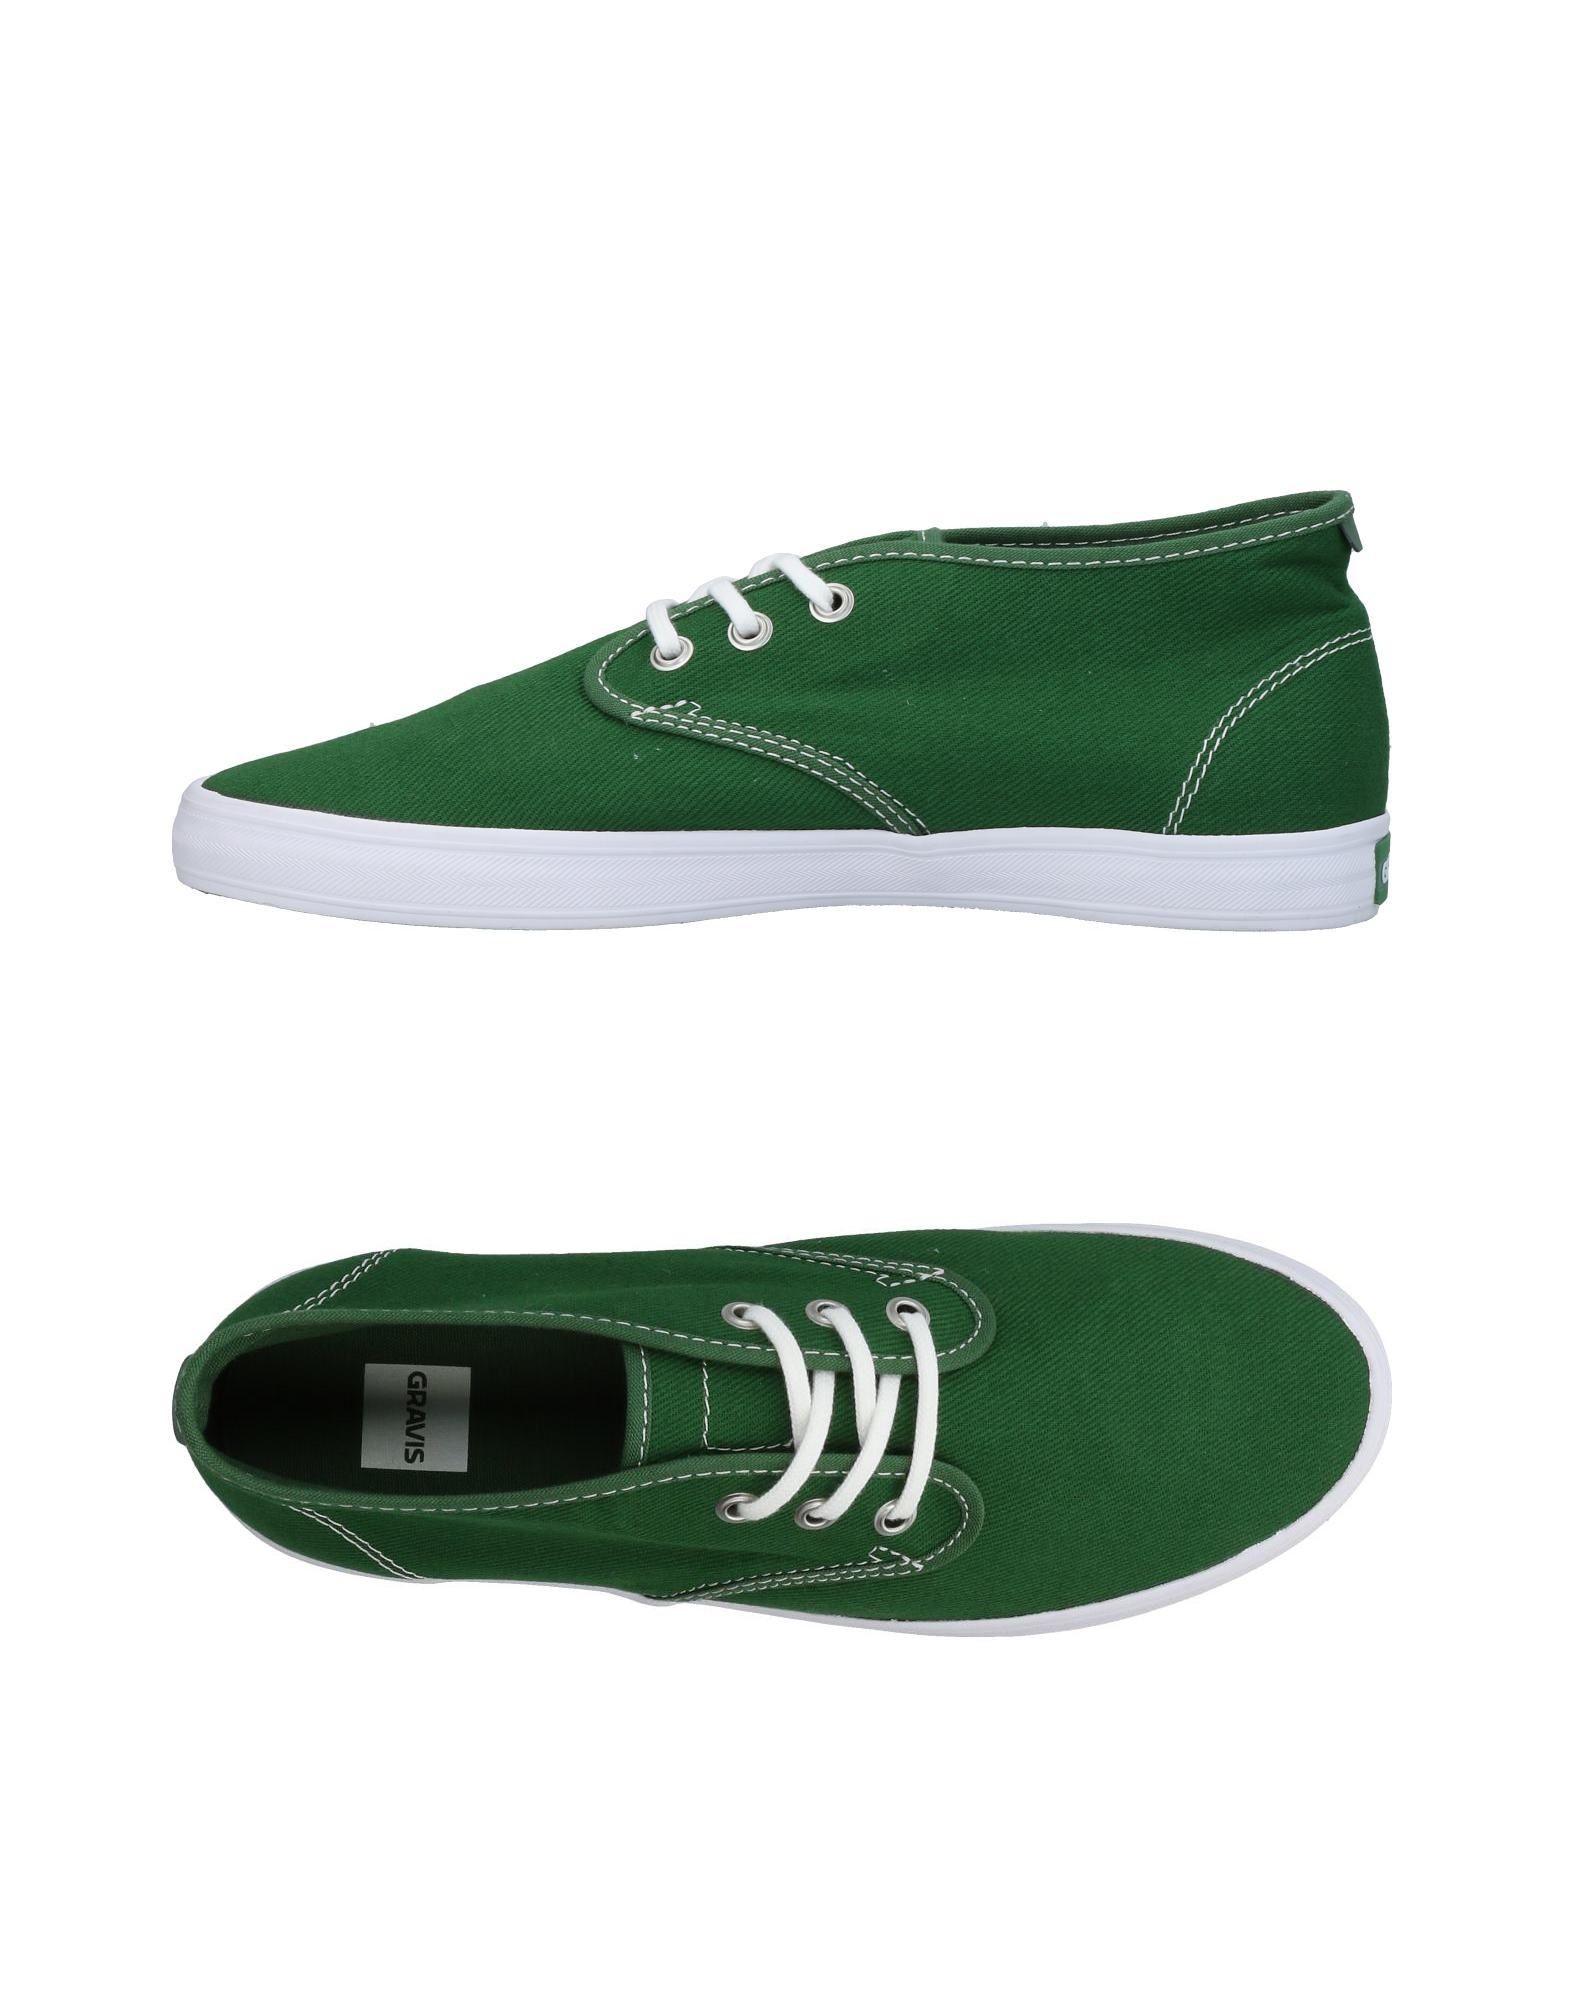 Sneakers Gravis Homme - Sneakers Gravis  Vert Chaussures femme pas cher homme et femme